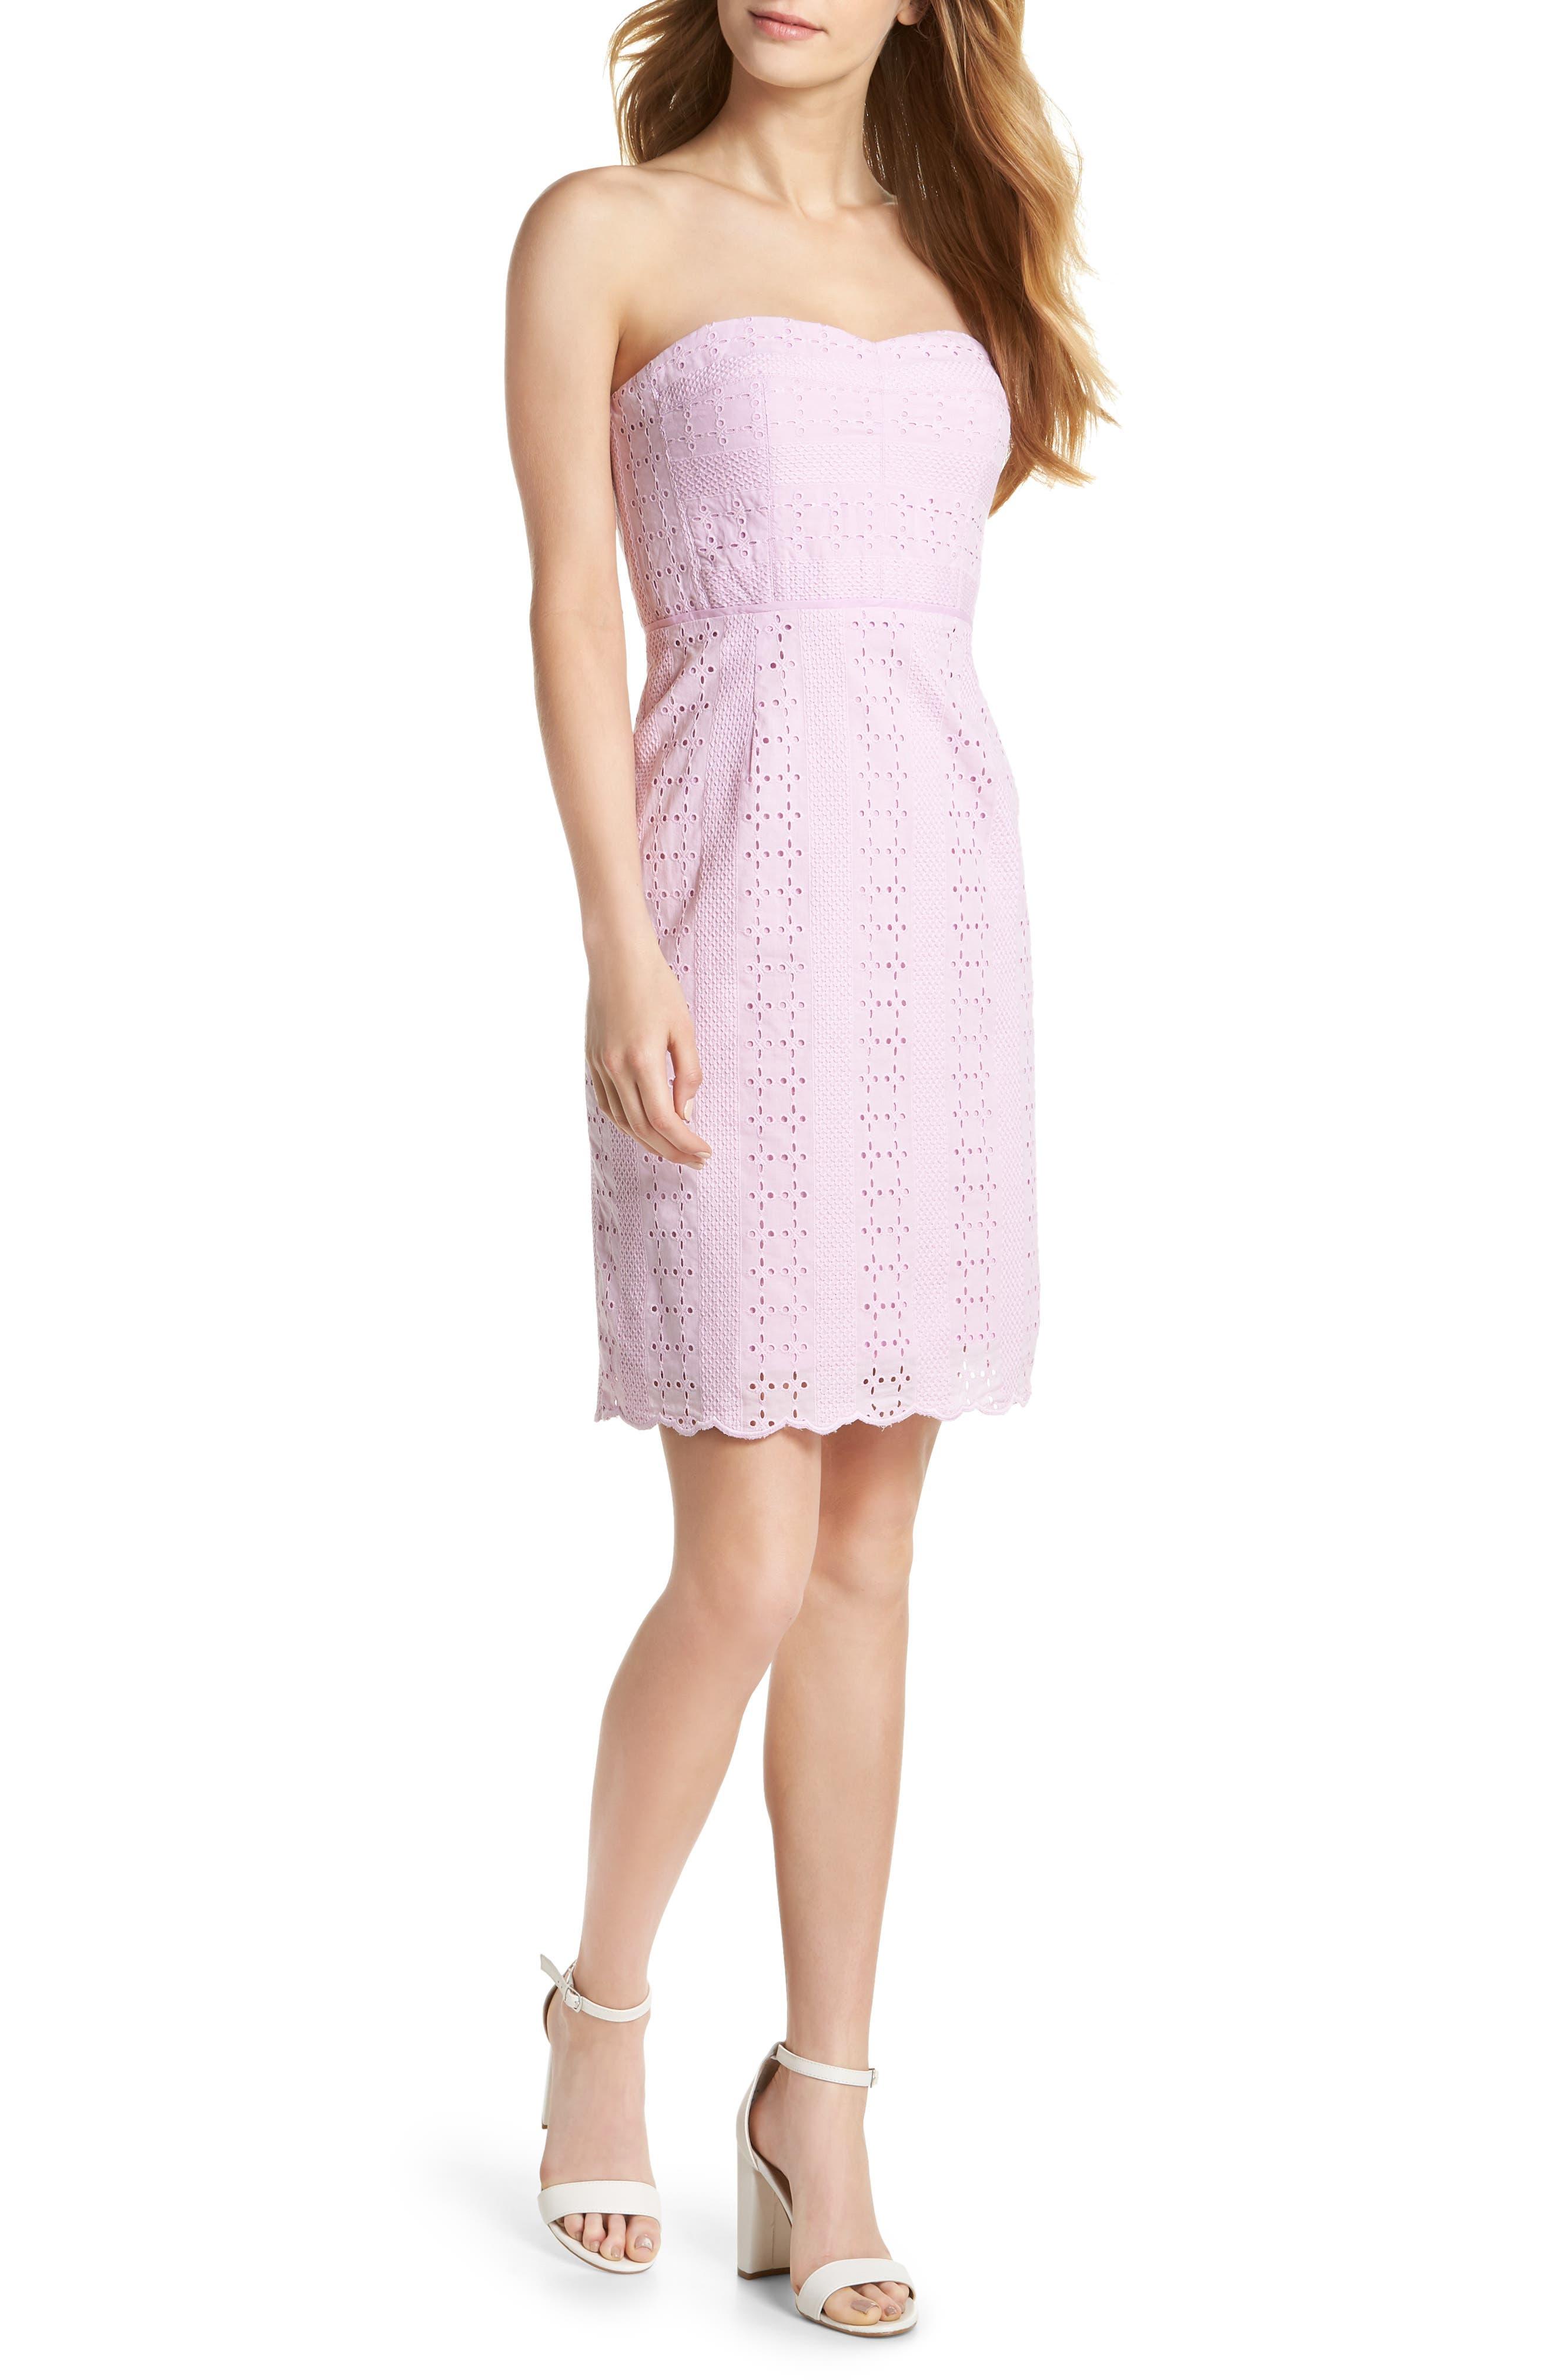 J.Crew Strapless Eyelet Sheath Dress,                             Main thumbnail 1, color,                             Lavender Mist